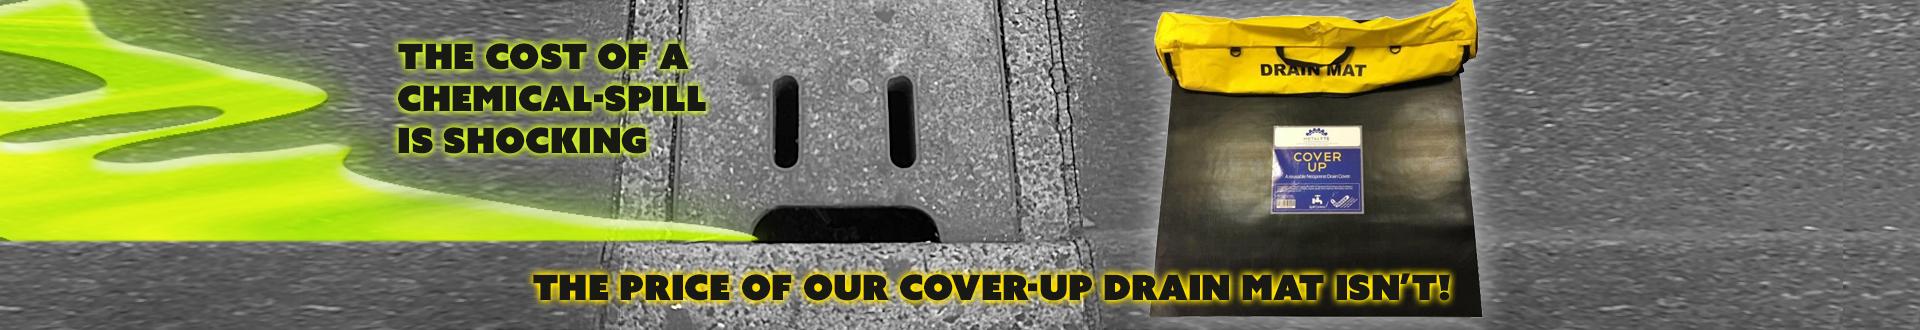 Slideshow-Coverup